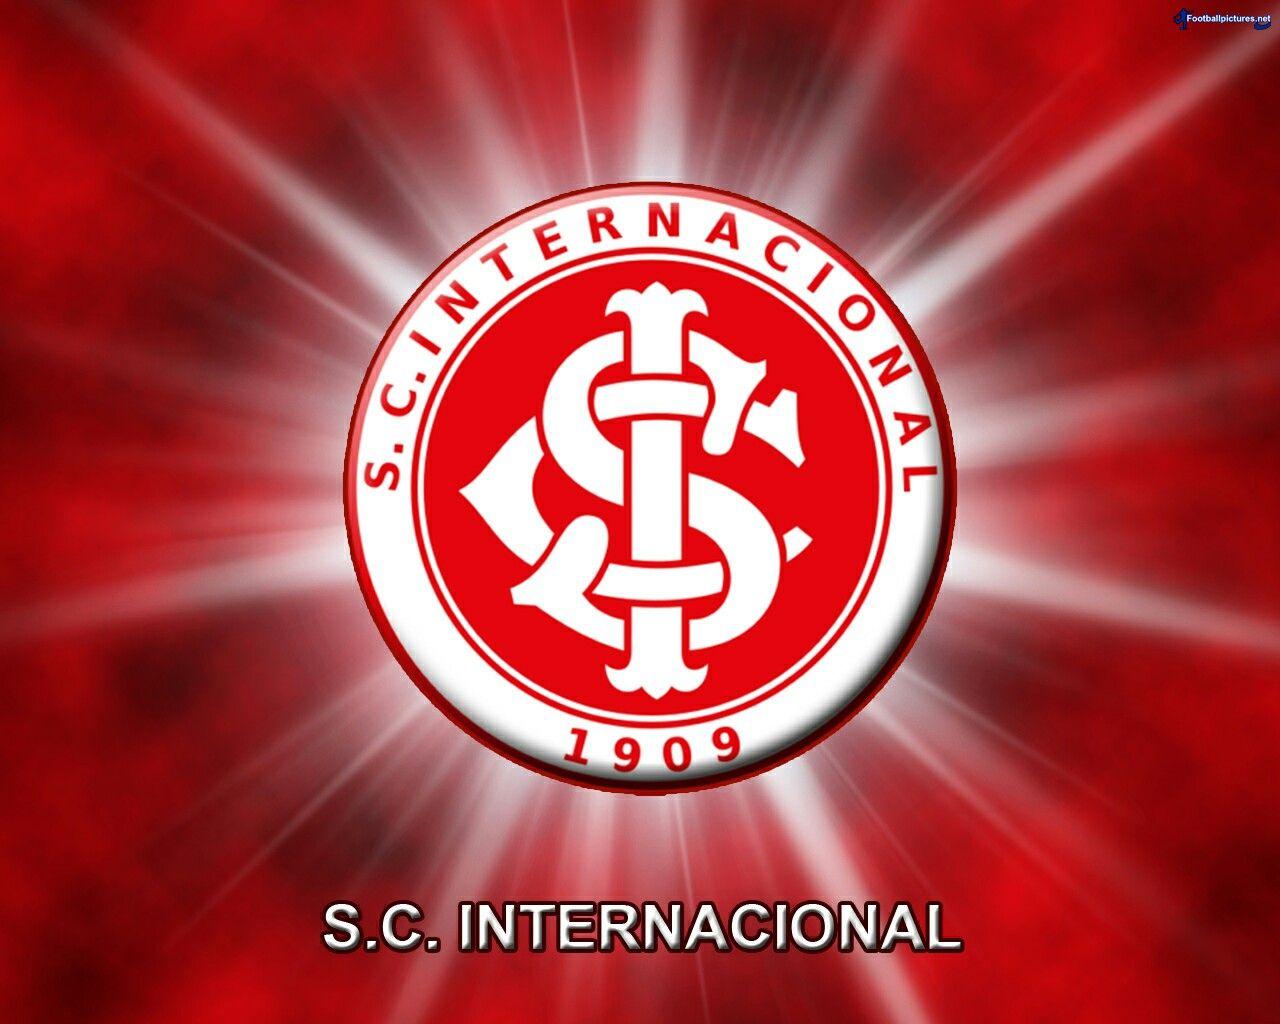 Sc Internacional Of Brazil Wallpaper Jogos De Futebol Sport Clube Internacional Sc Internacional